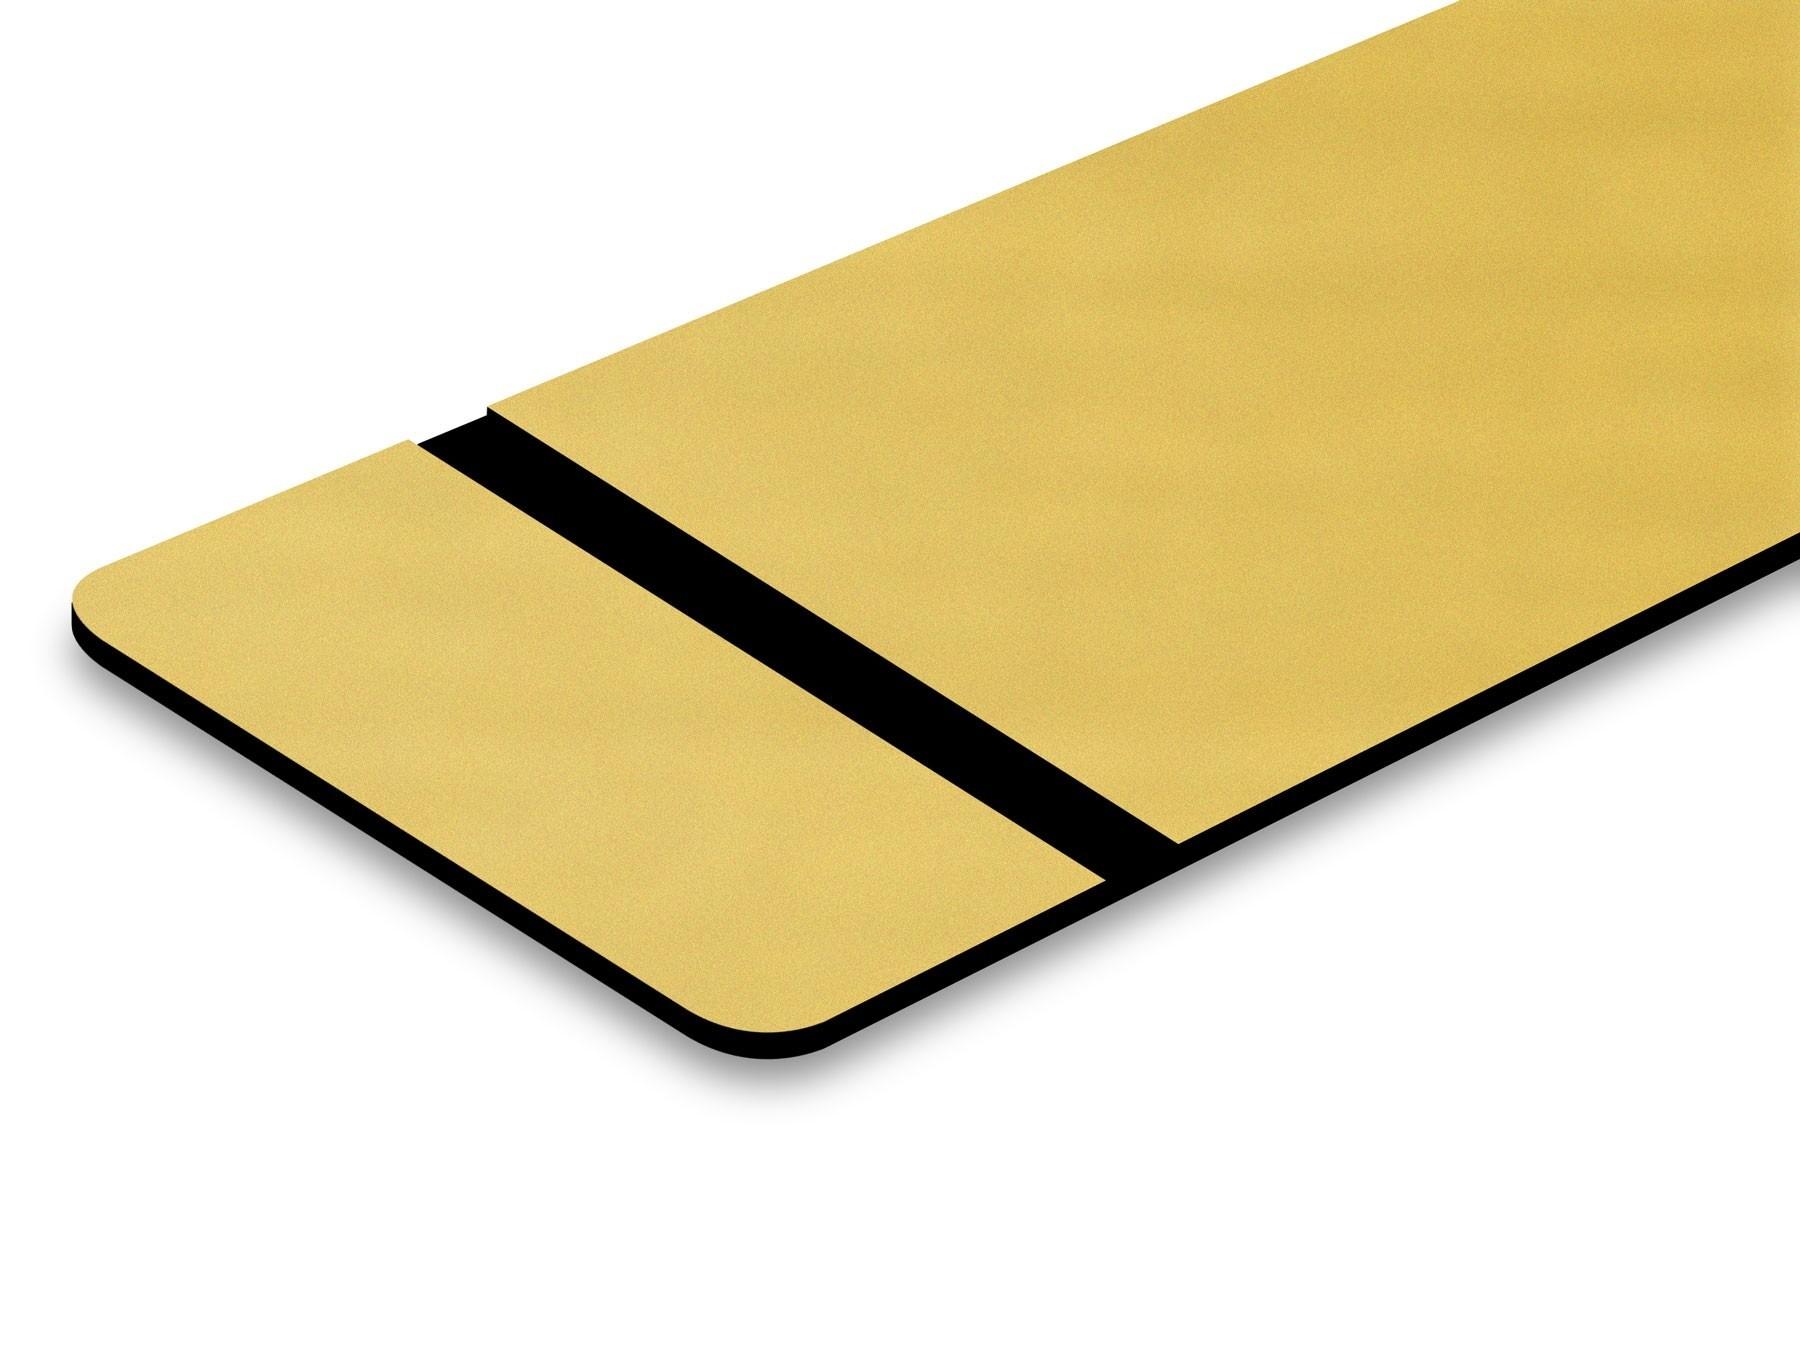 TroLase Lights, Smooth Gold/Black, 2ply, 0.1 mm